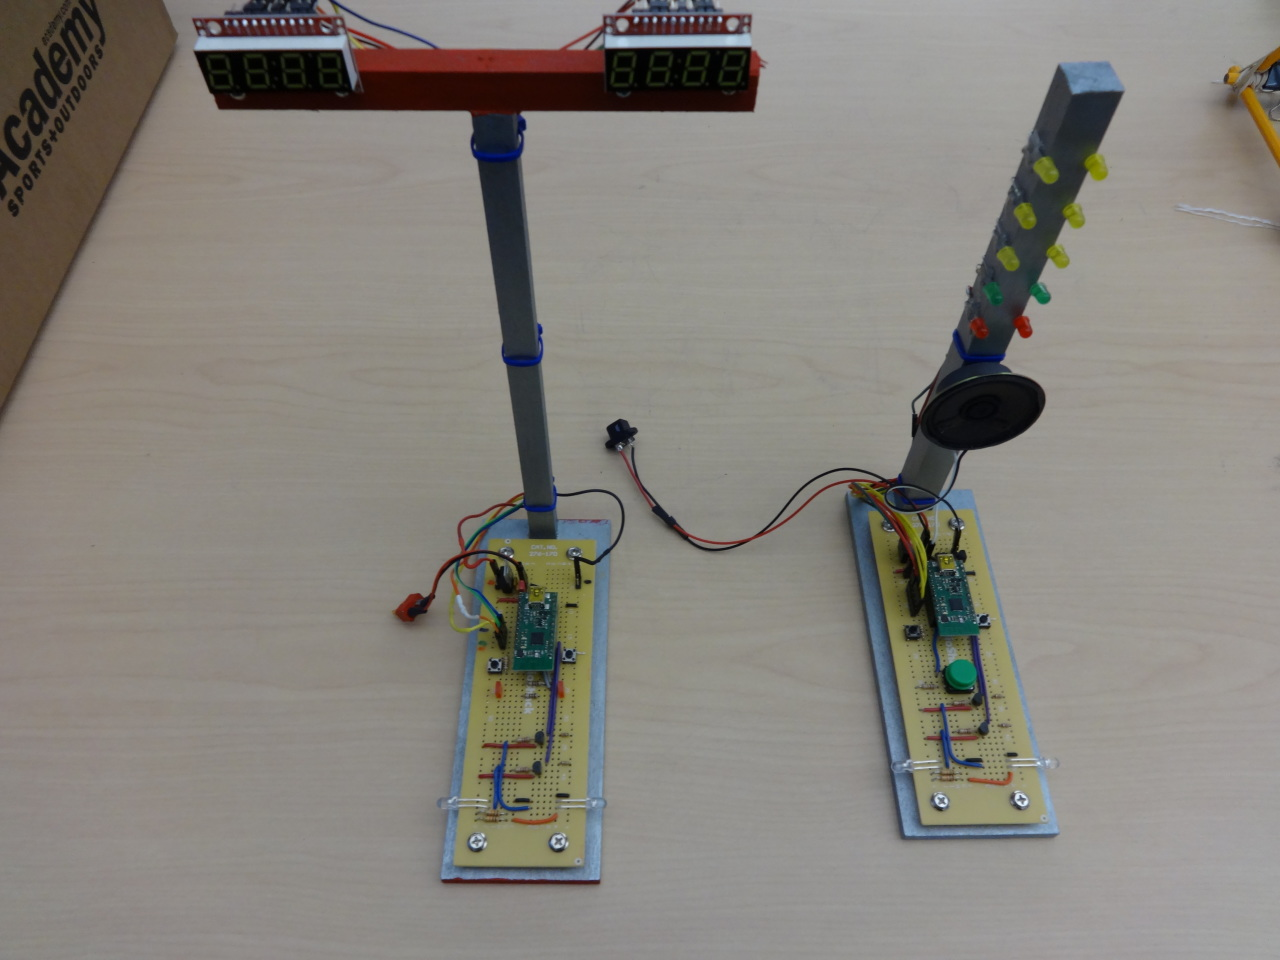 Rc Timing Circuits